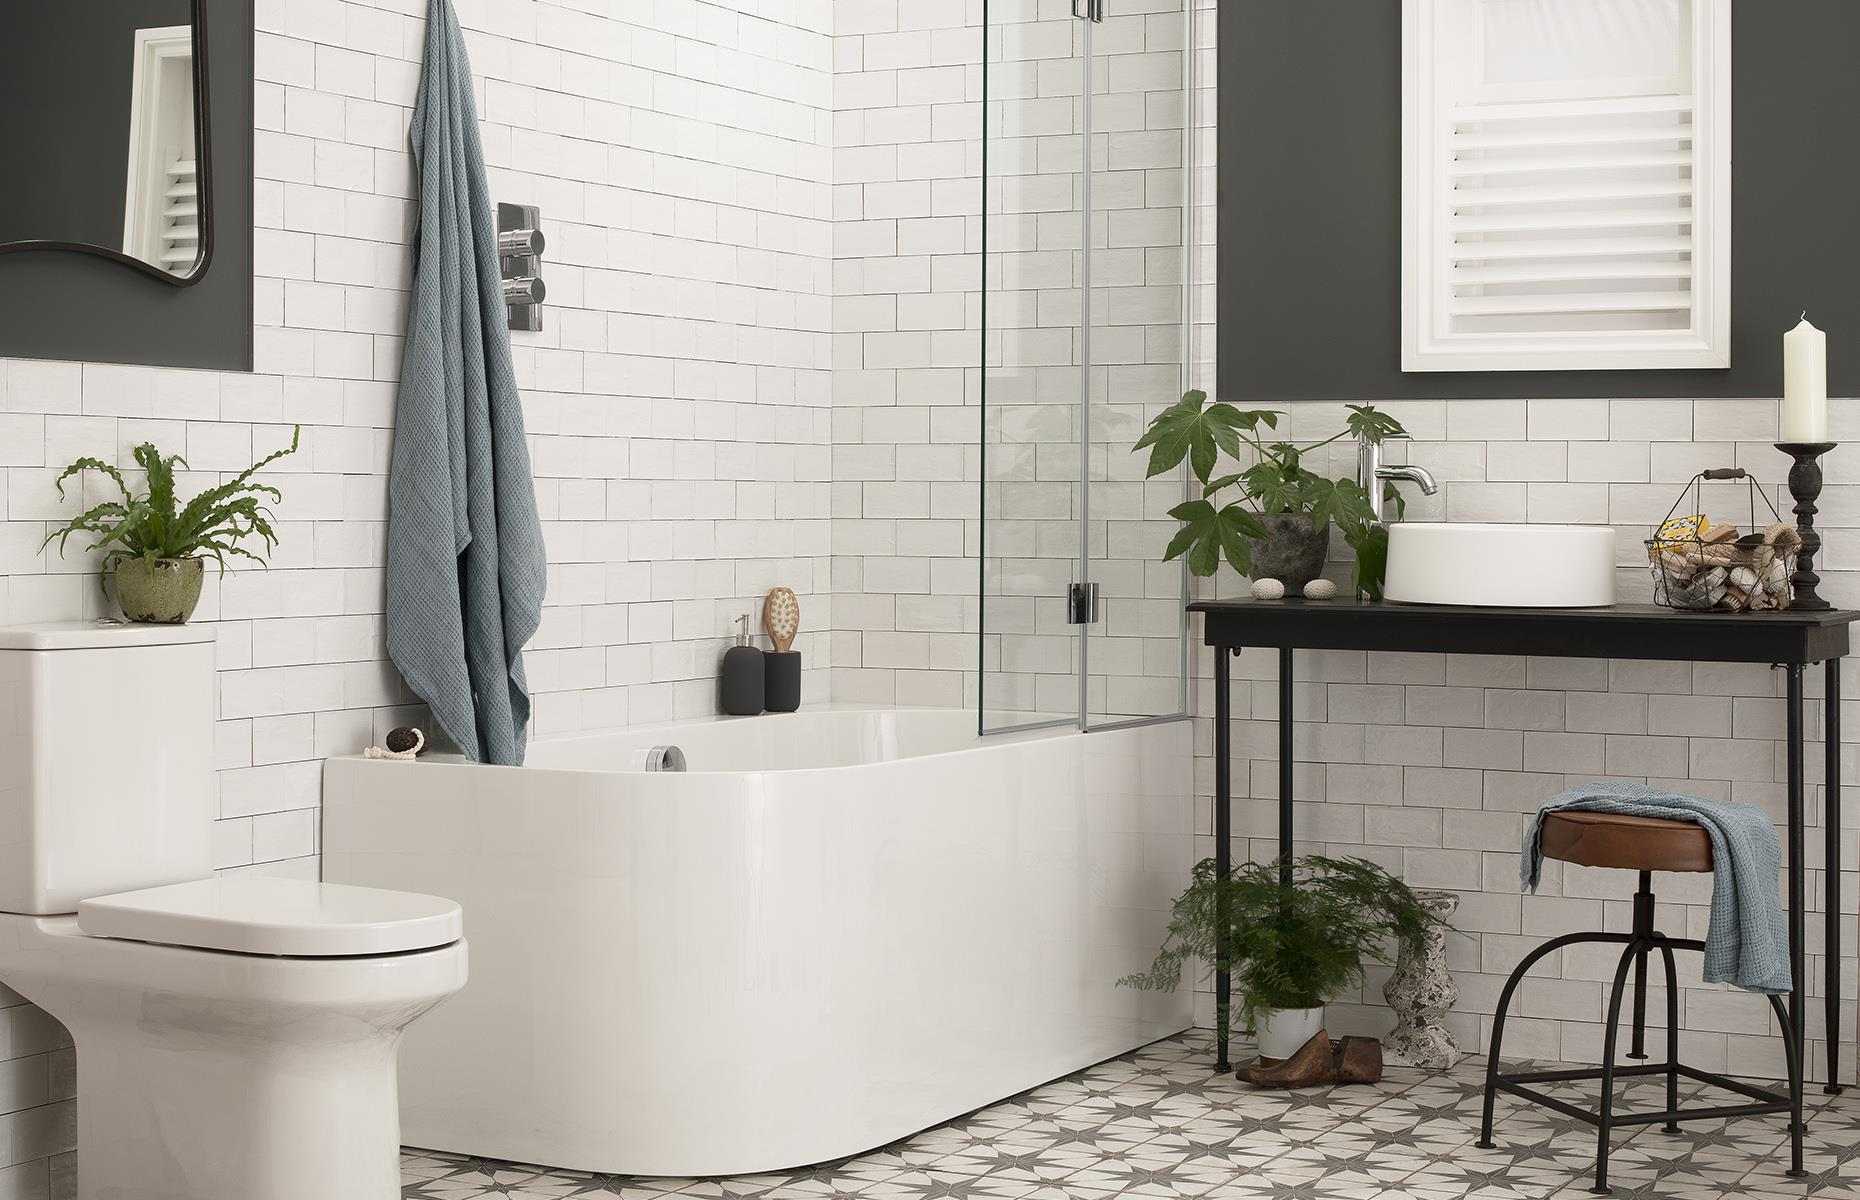 Image: Walls and Floors Ltd